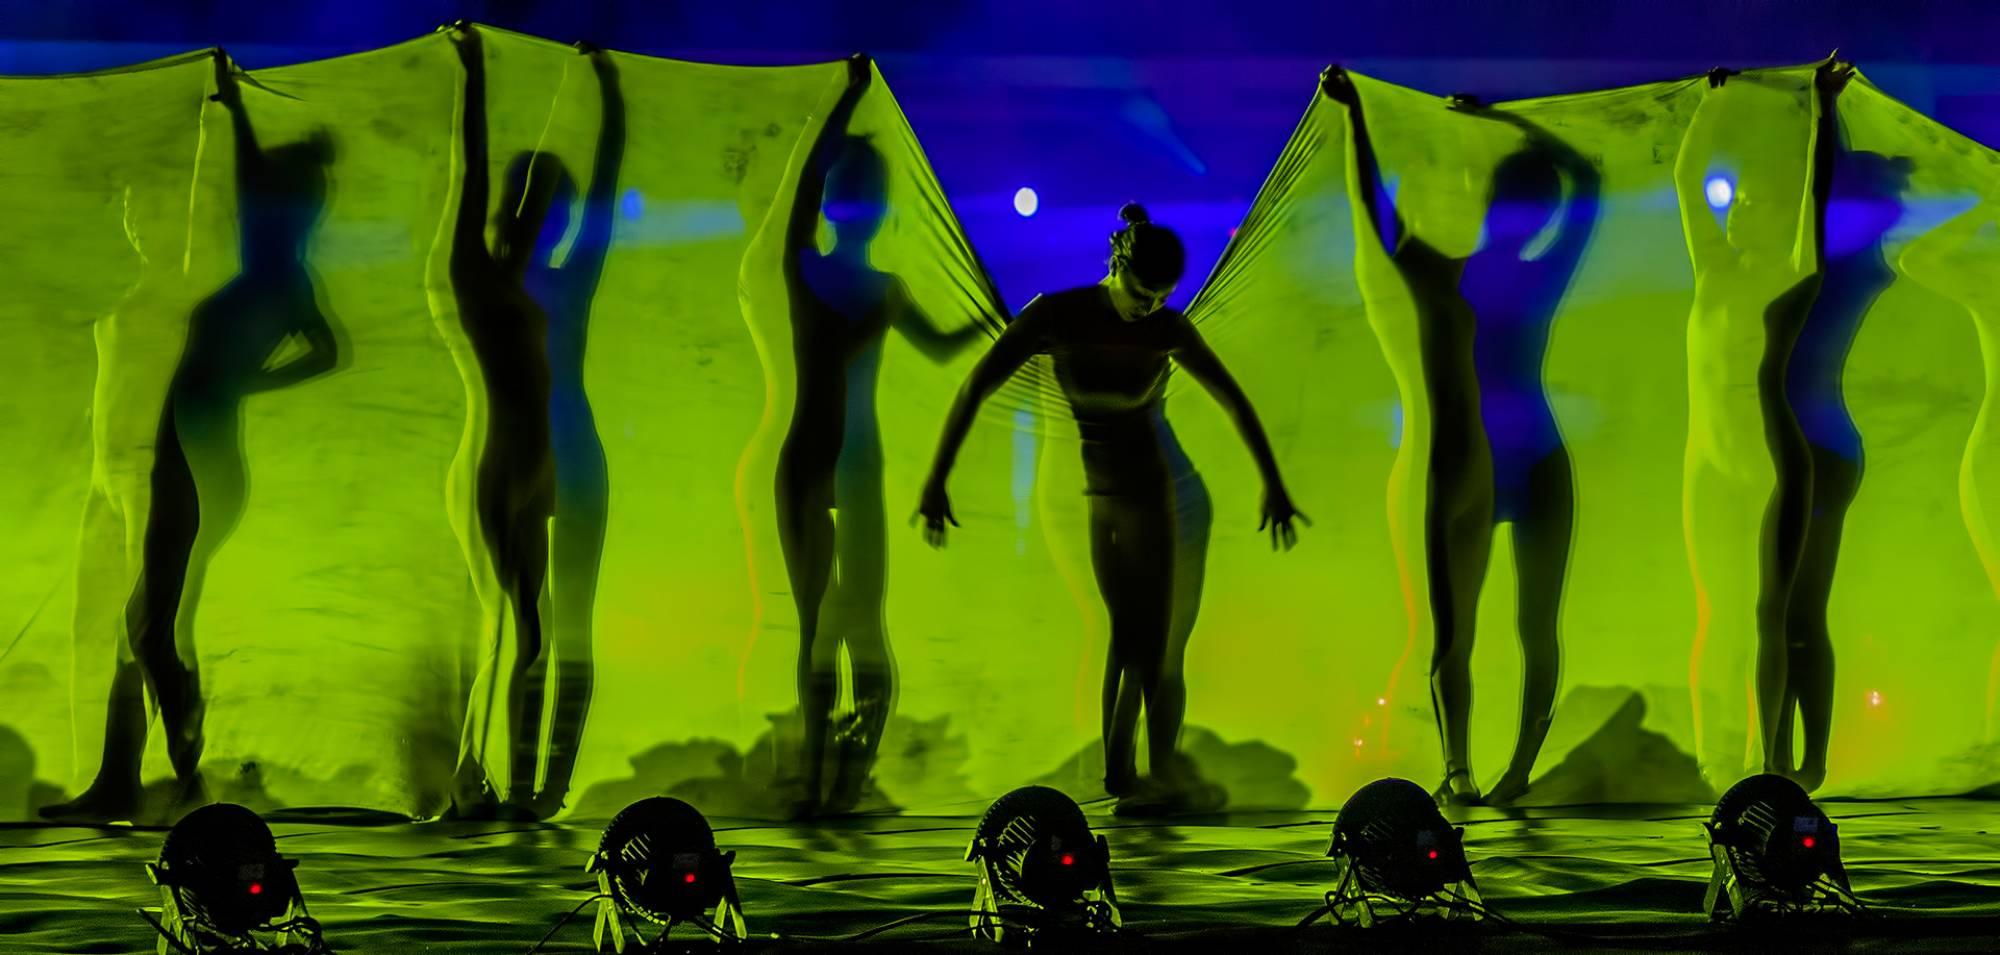 02 PSA Gold Medal, Mehmet Gokyigit, Cyprus, dancers of darkness